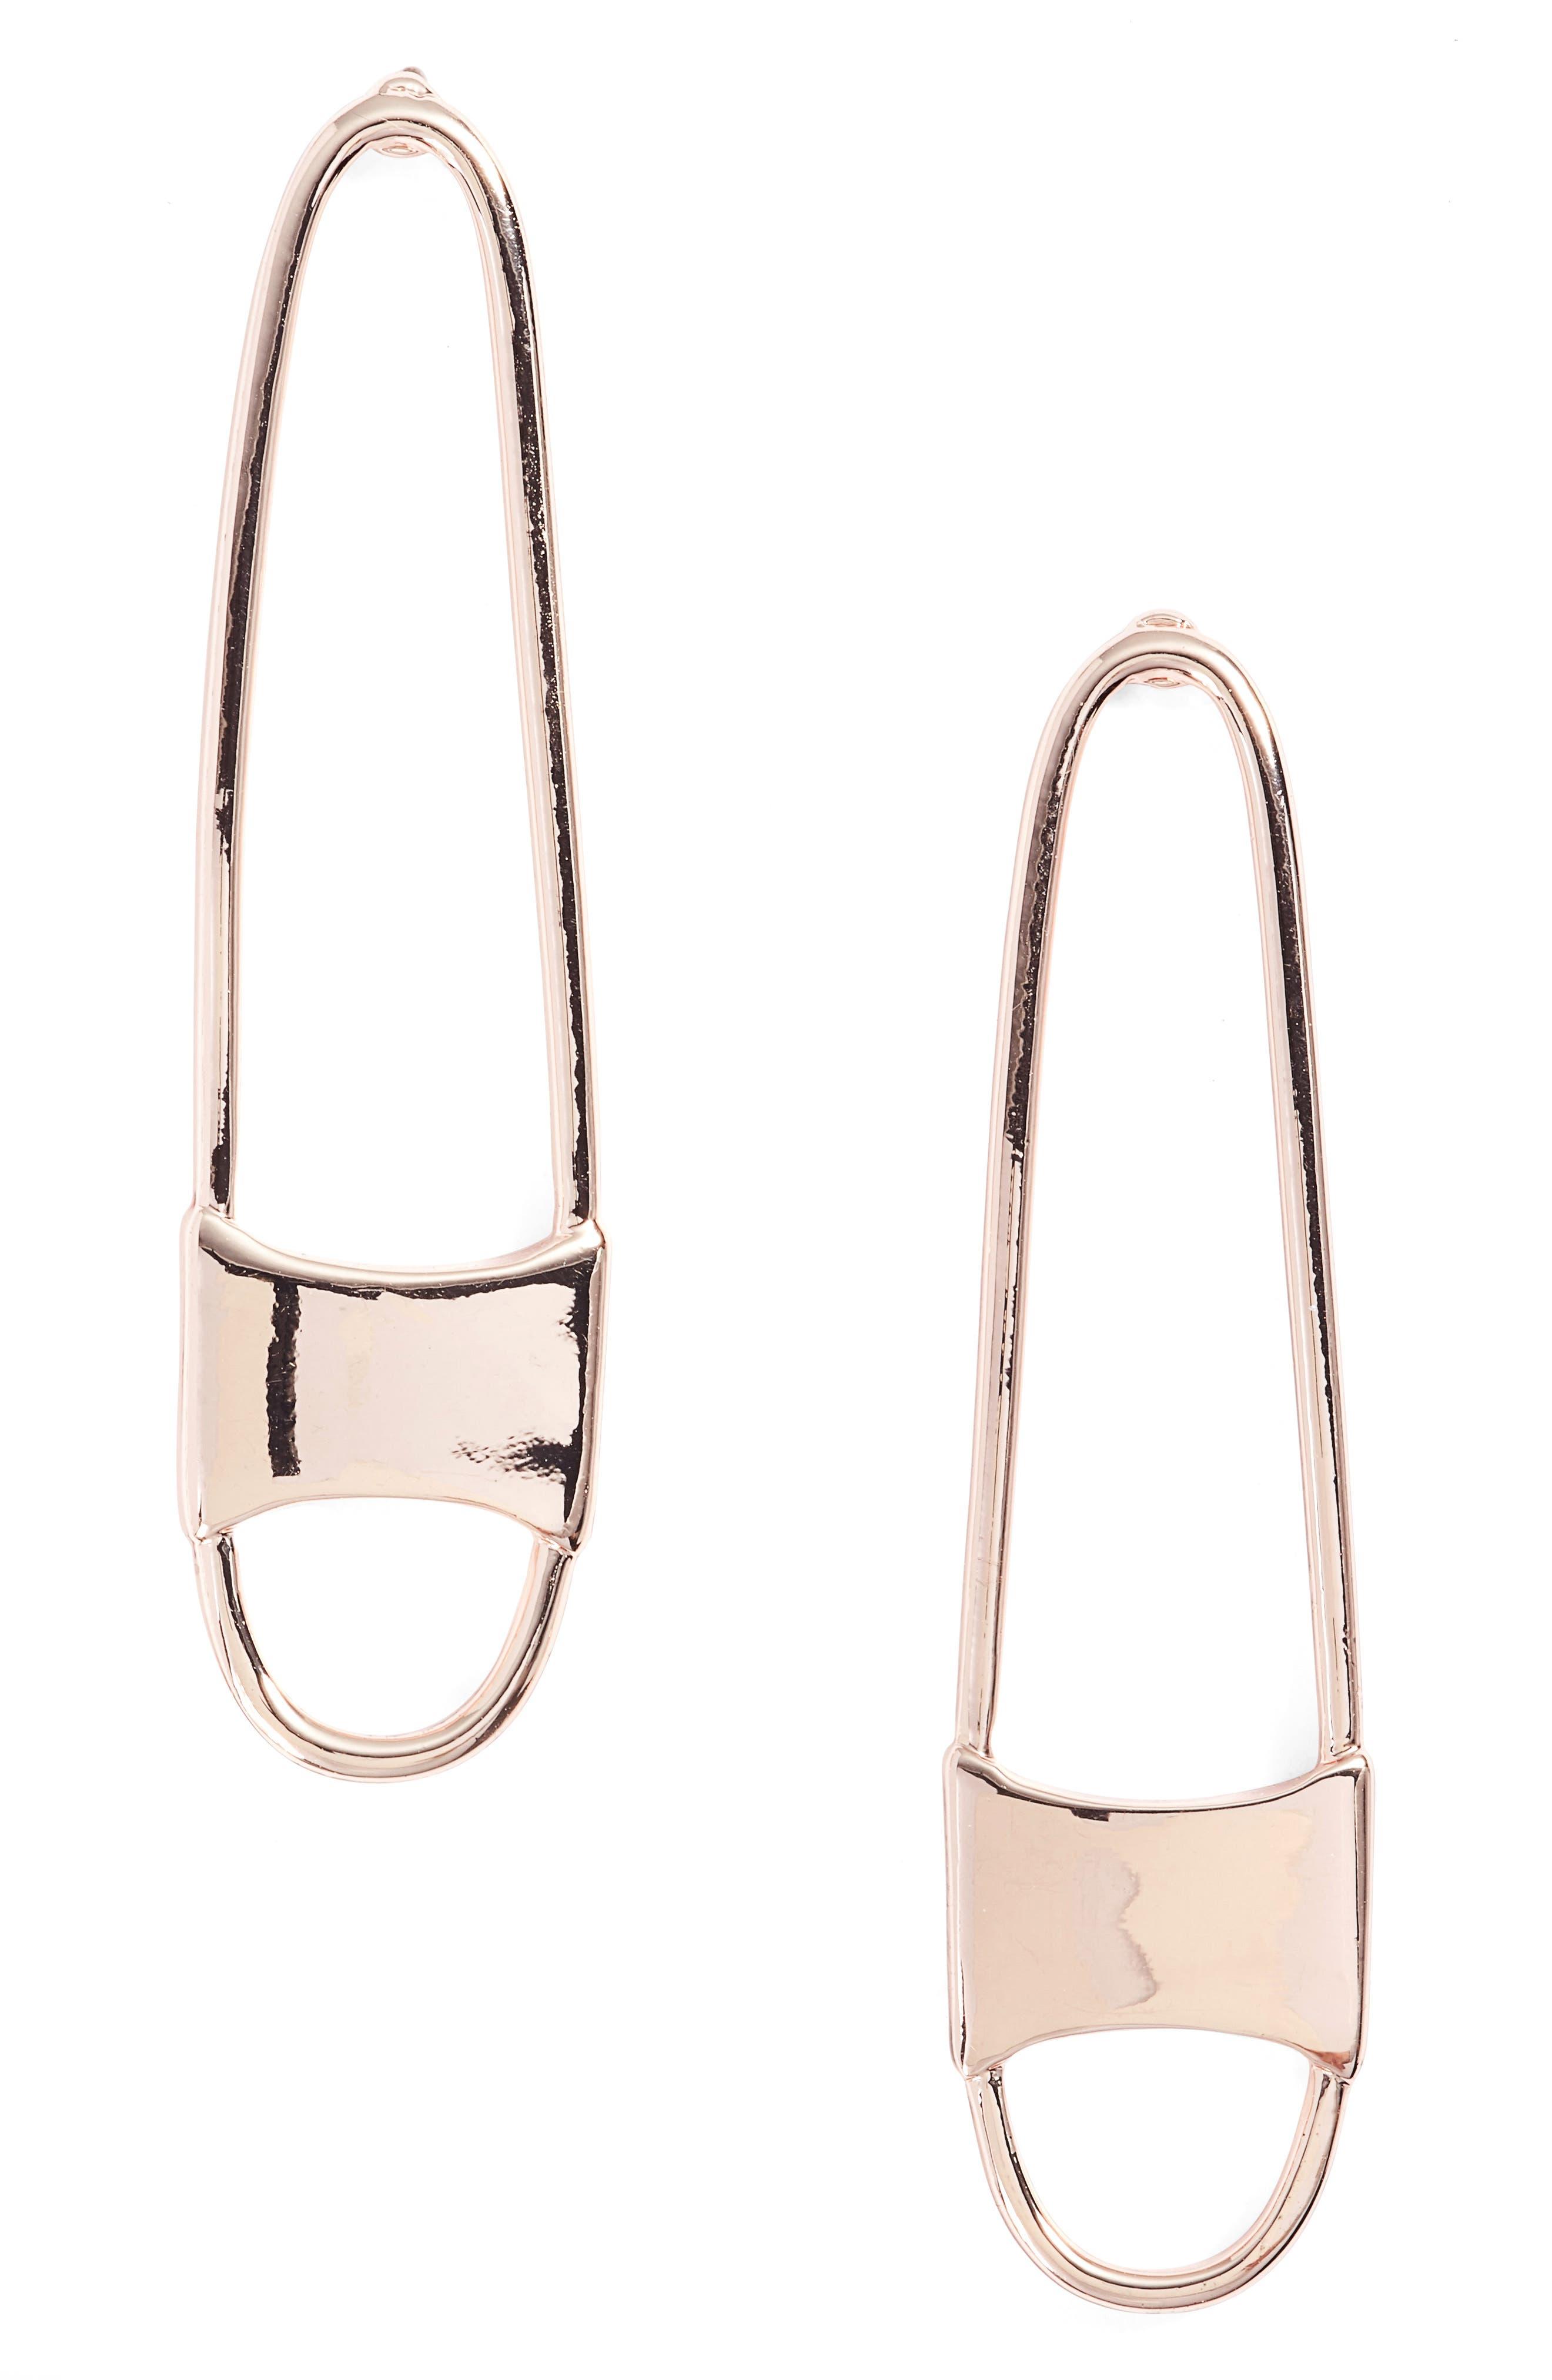 REBECCA MINKOFF Runway Pin Drop Earrings